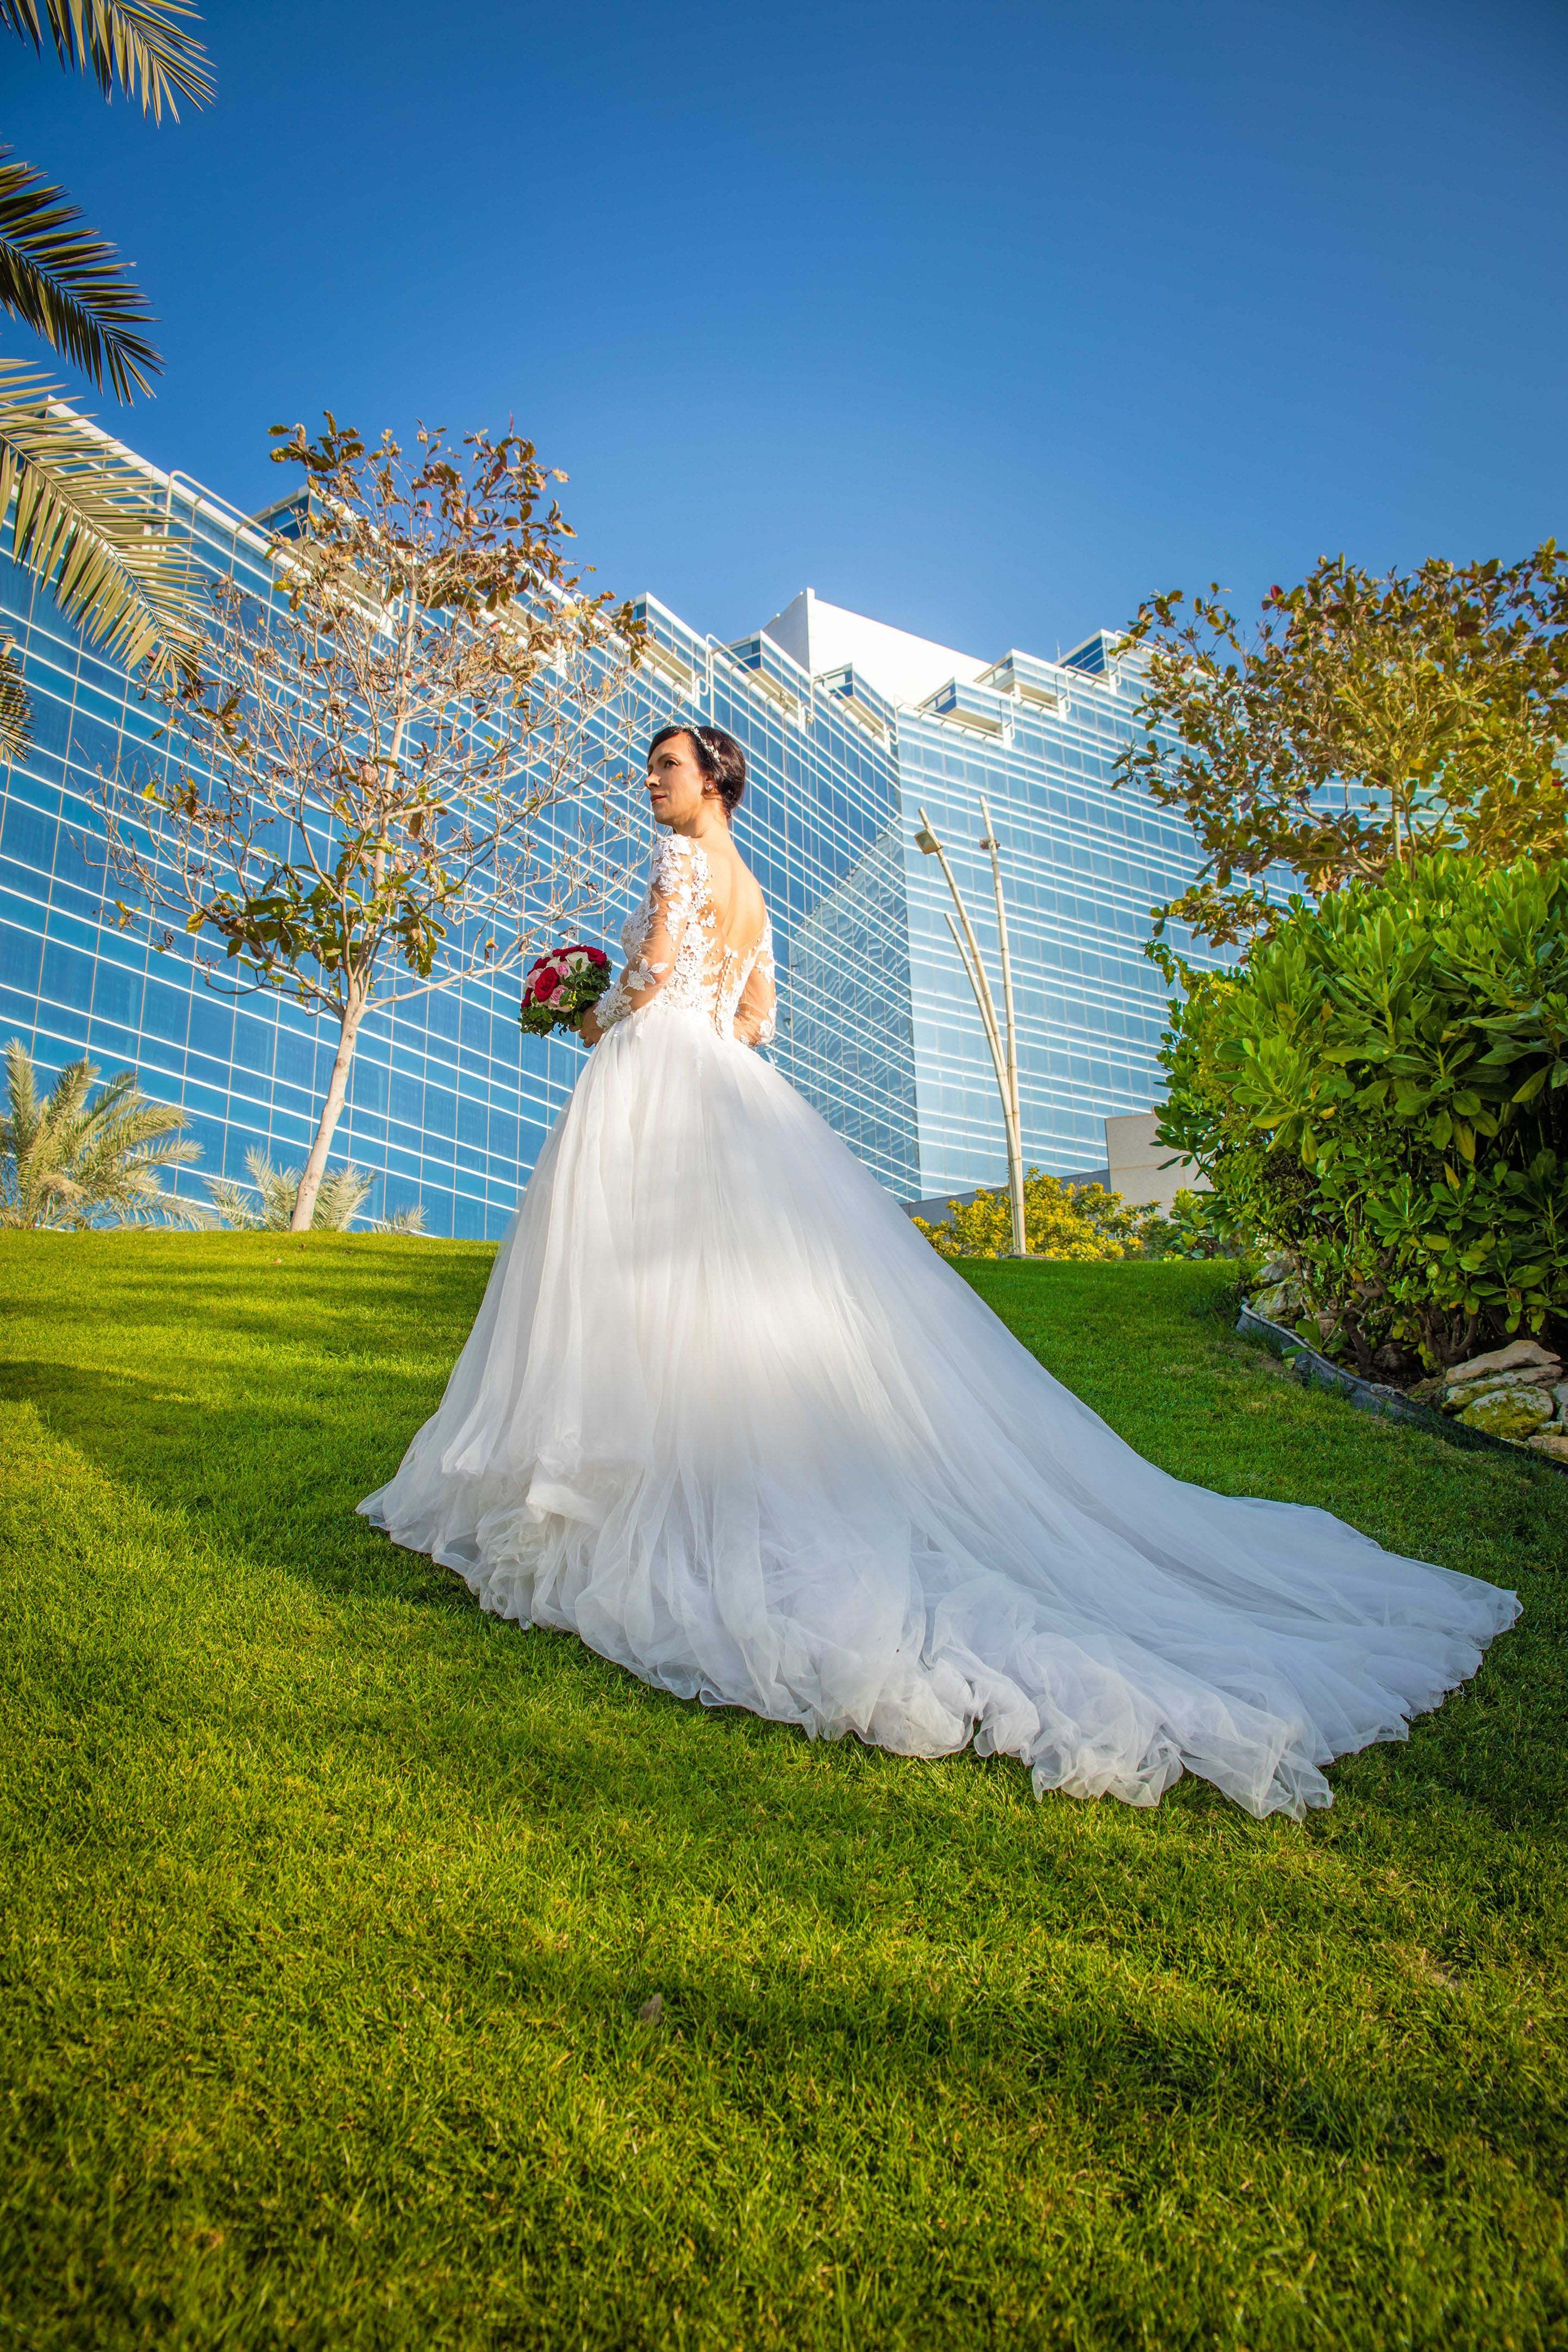 Wedding Nina Mommsen Photographer Bahrain Manama Professional Bride Dress Photographer Bride Wedding